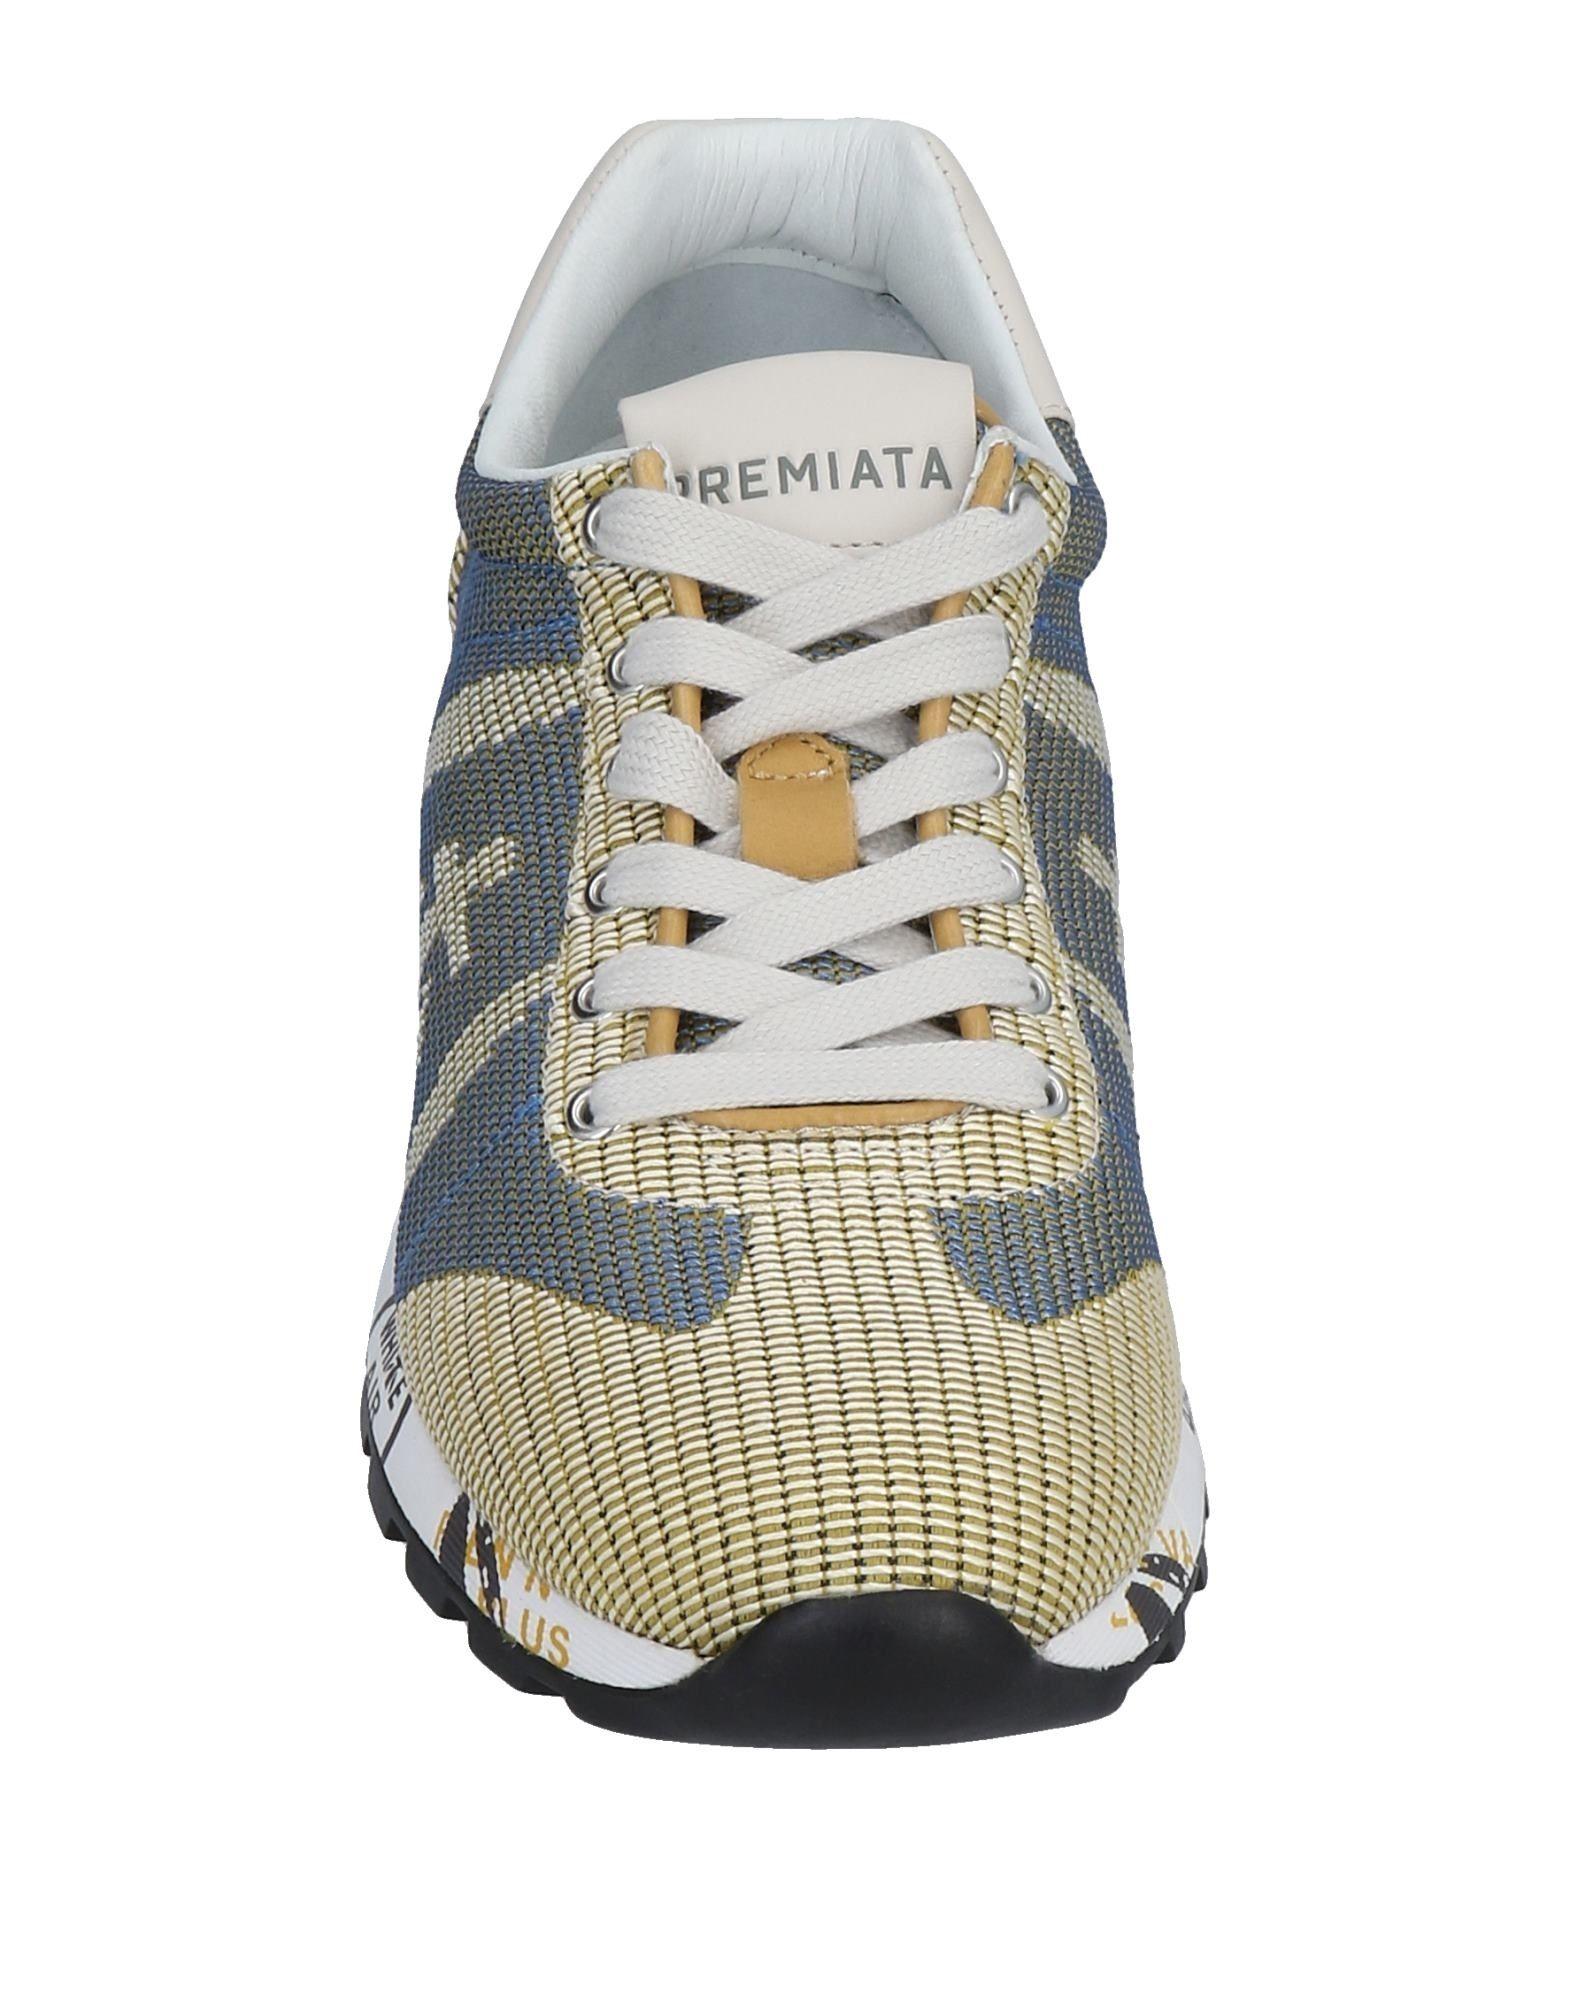 Stilvolle billige Schuhe 11497330BD Premiata Sneakers Damen  11497330BD Schuhe 625e49